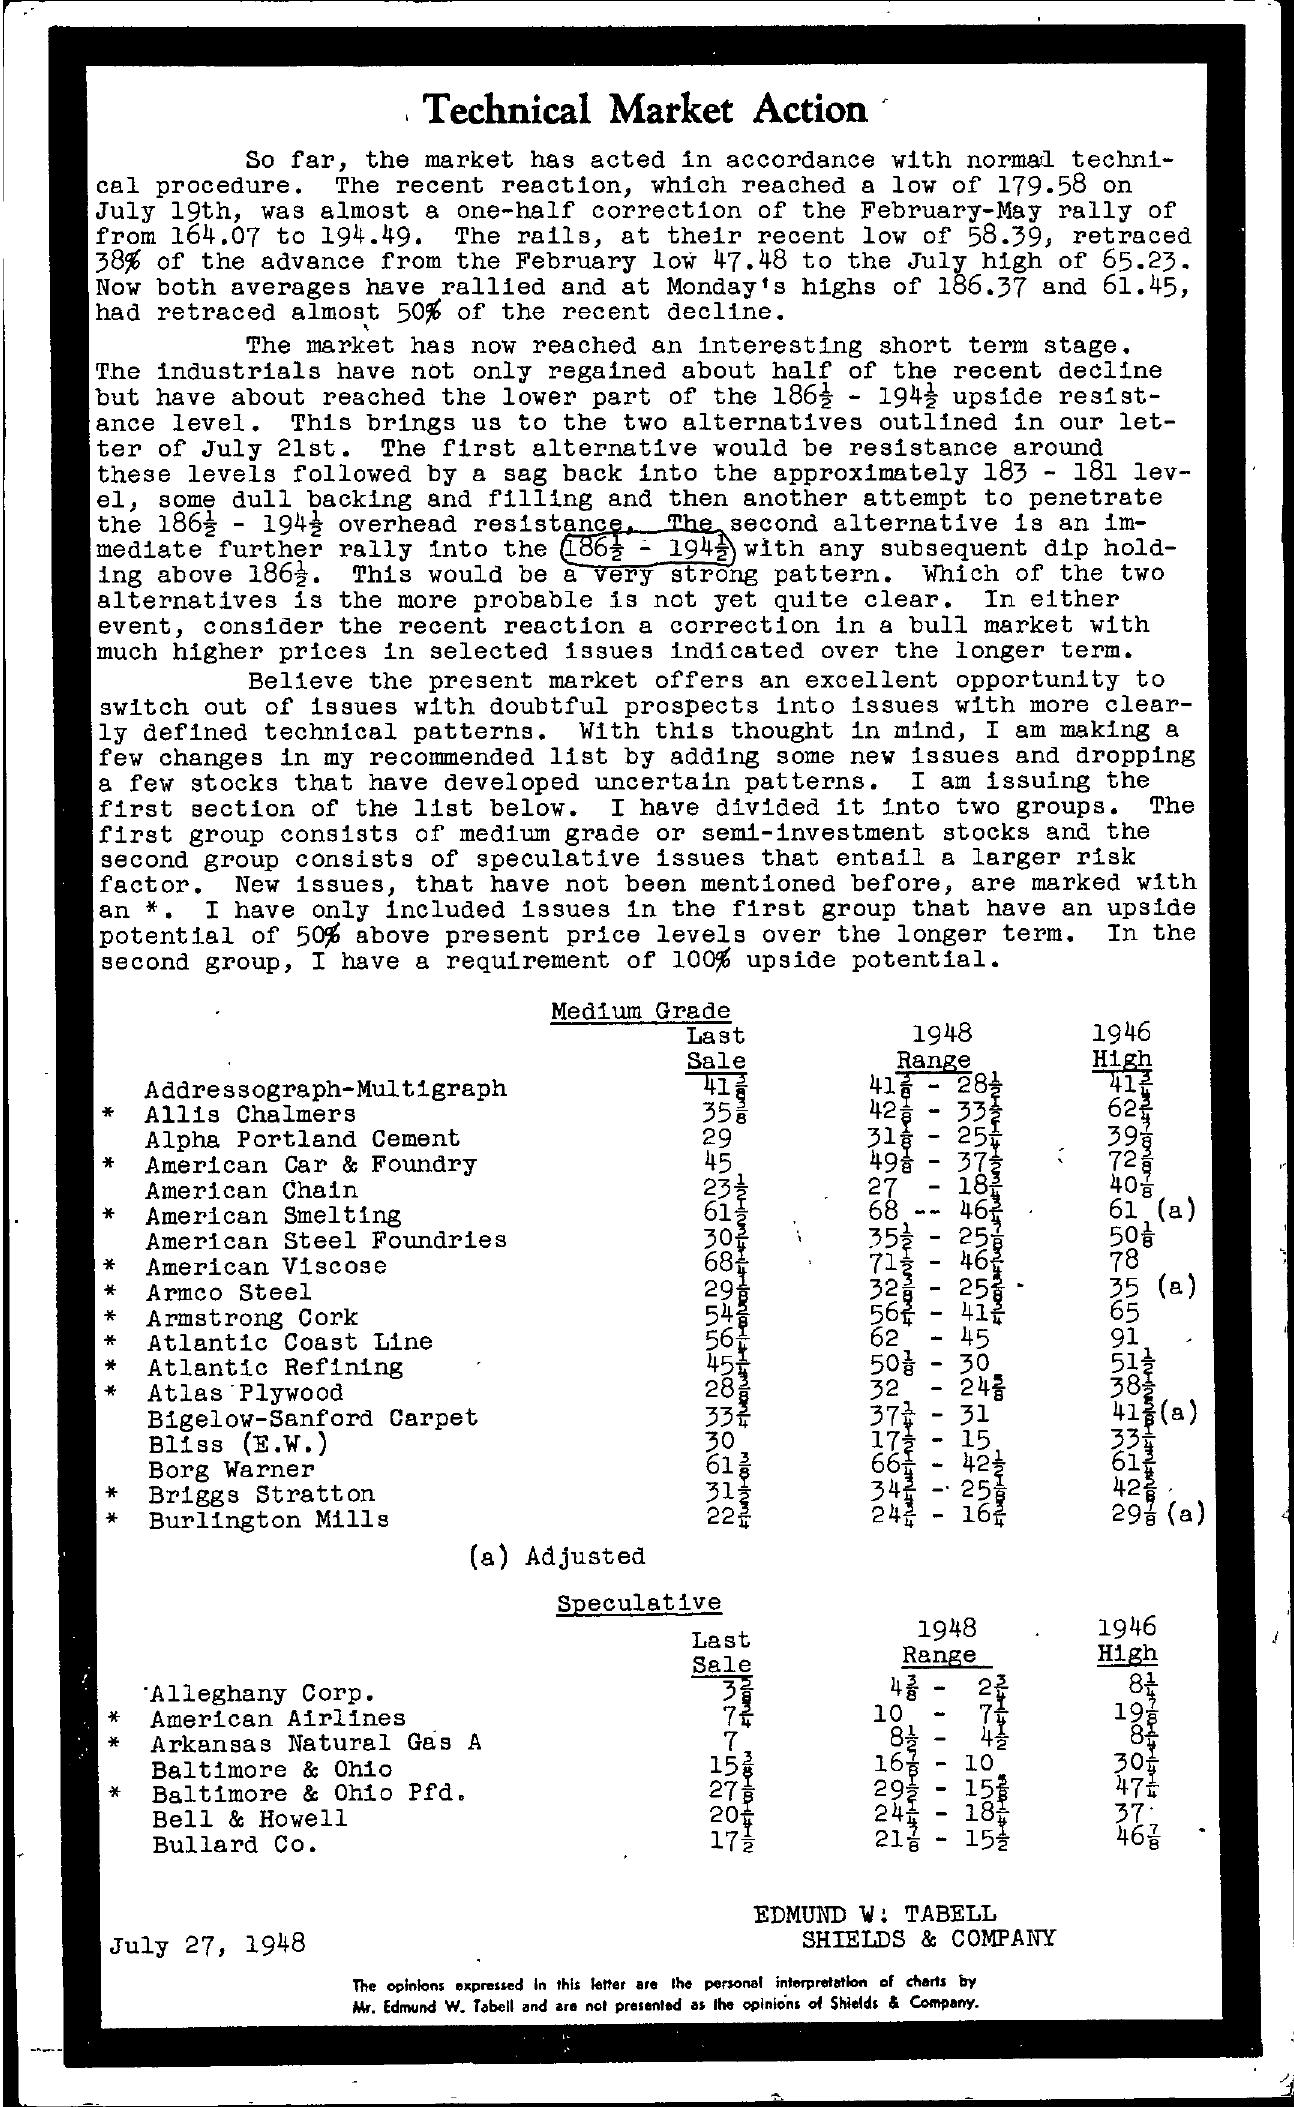 Tabell's Market Letter - July 27, 1948